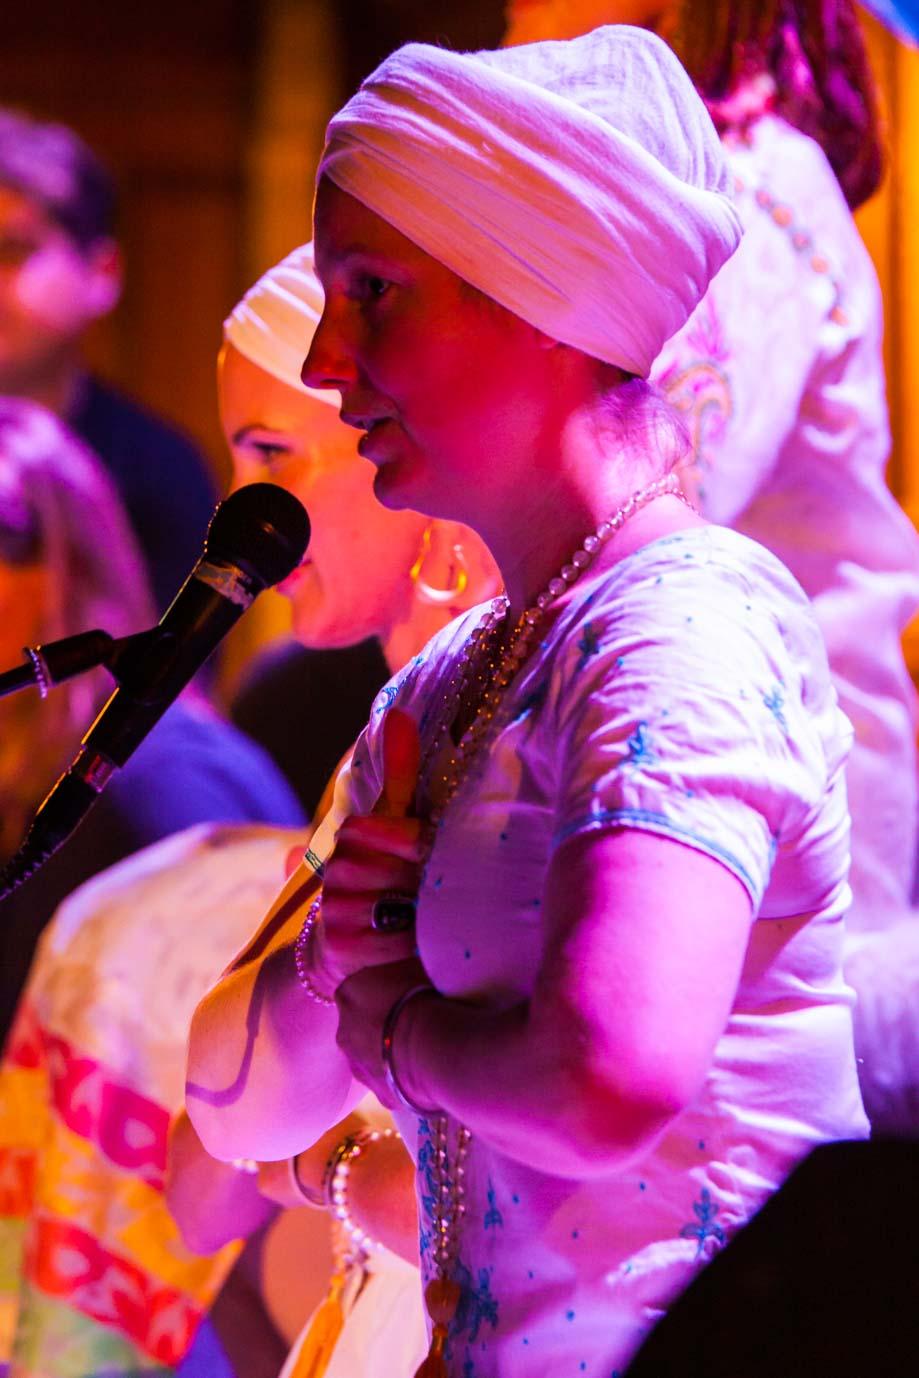 Sat Shakti demonstrates Shiv Kriya at Wilder Shores album launch with Belinda Carlisle. Photo by Vik Singh Taak.